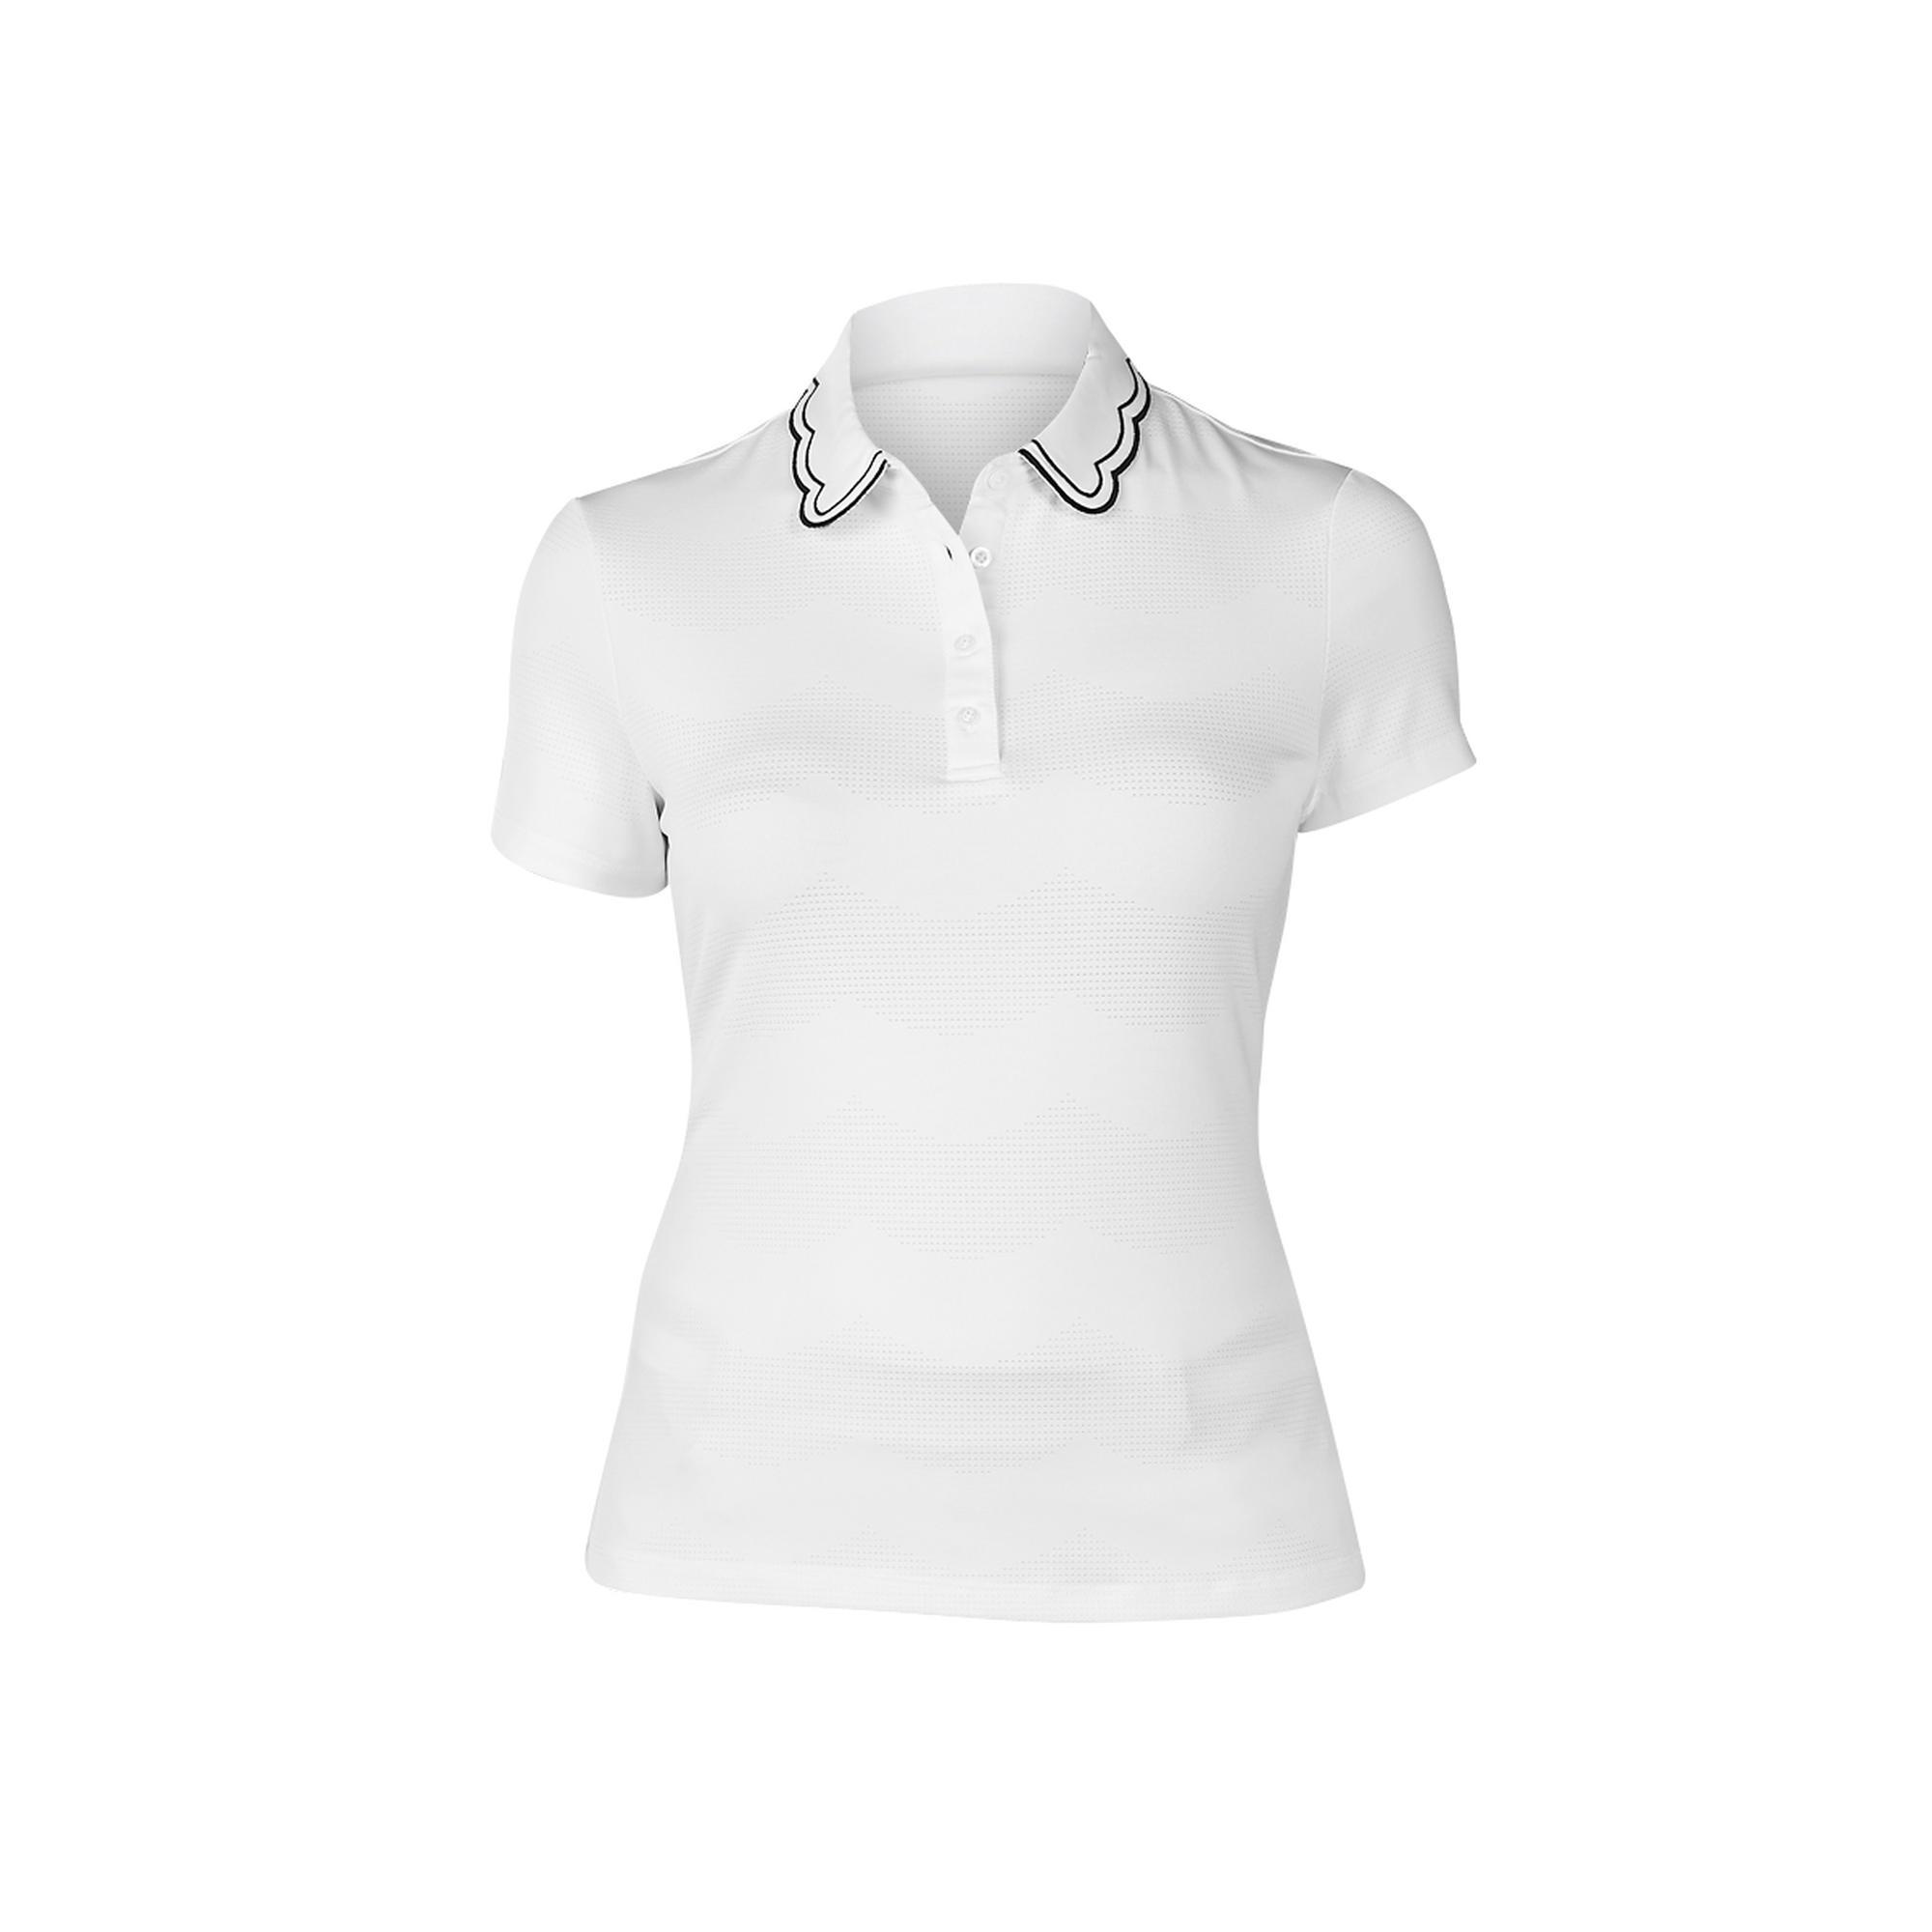 Women's Wendy Scalloped Collar Short Sleeve Polo